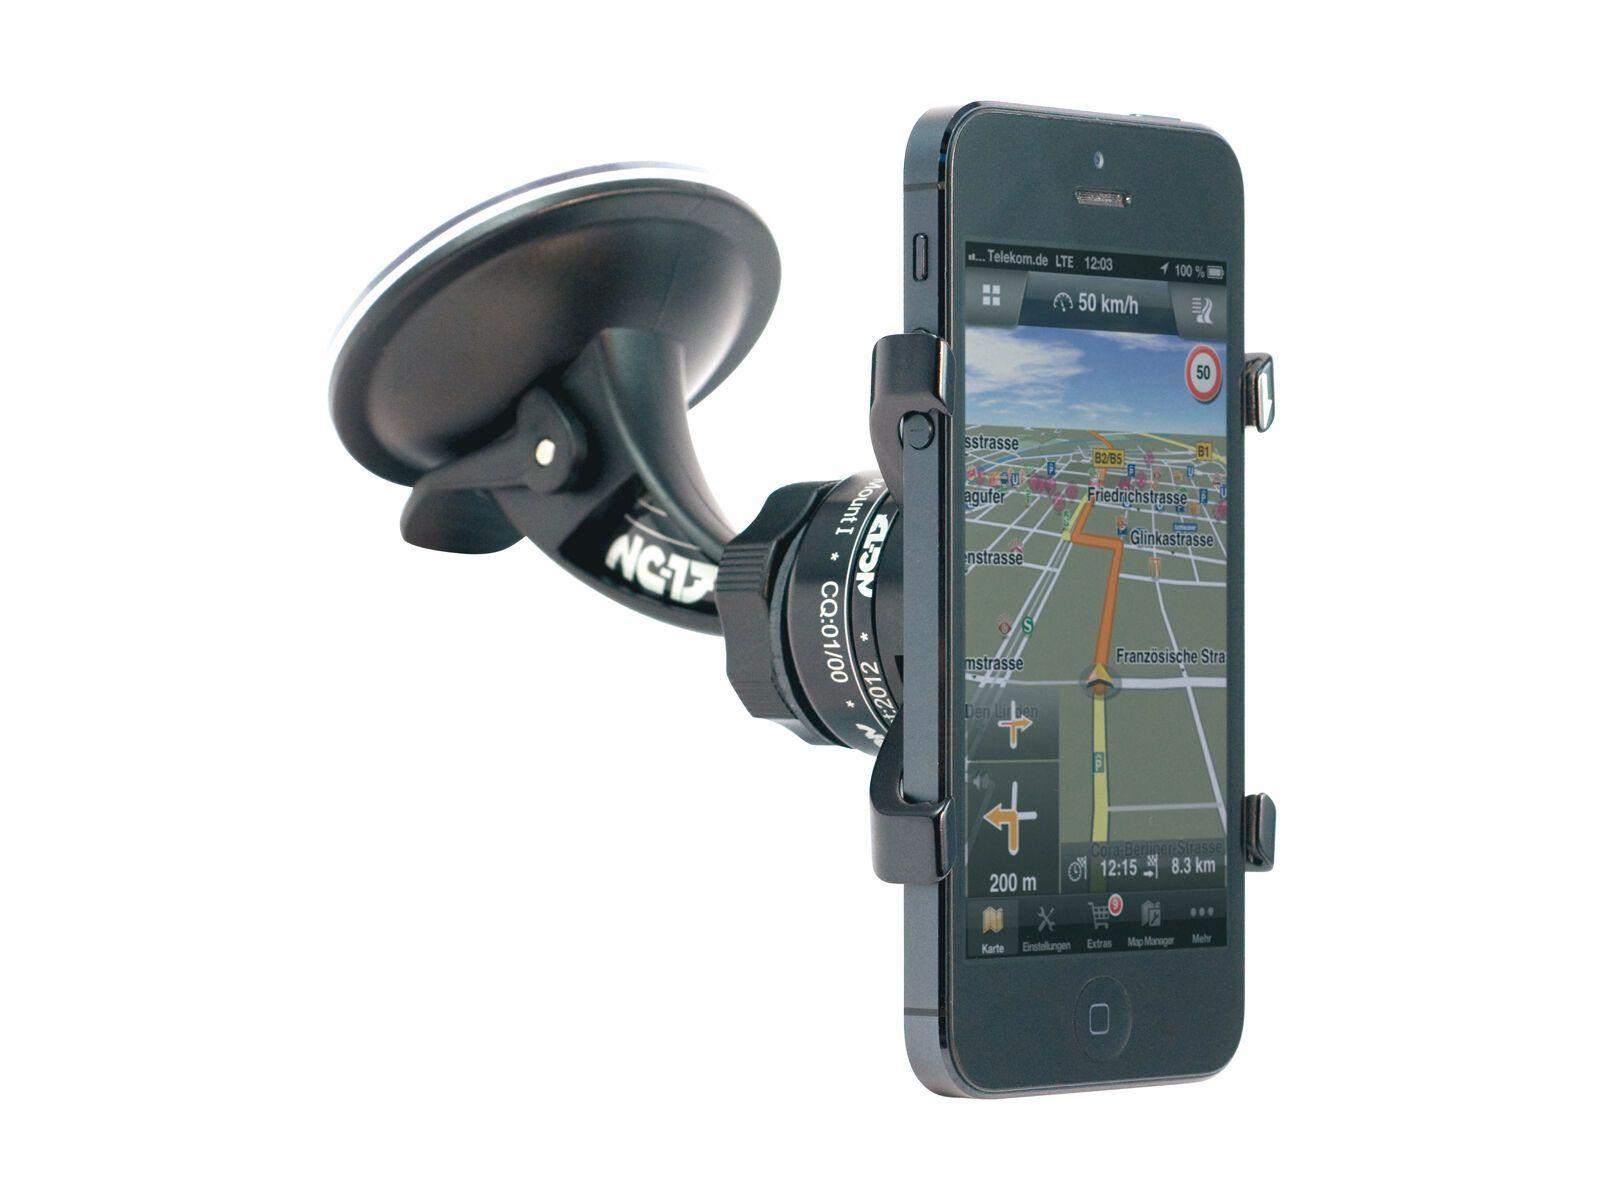 NC-17 iPhone Auto-Halter - Montage an Autoscheibe, black 4003